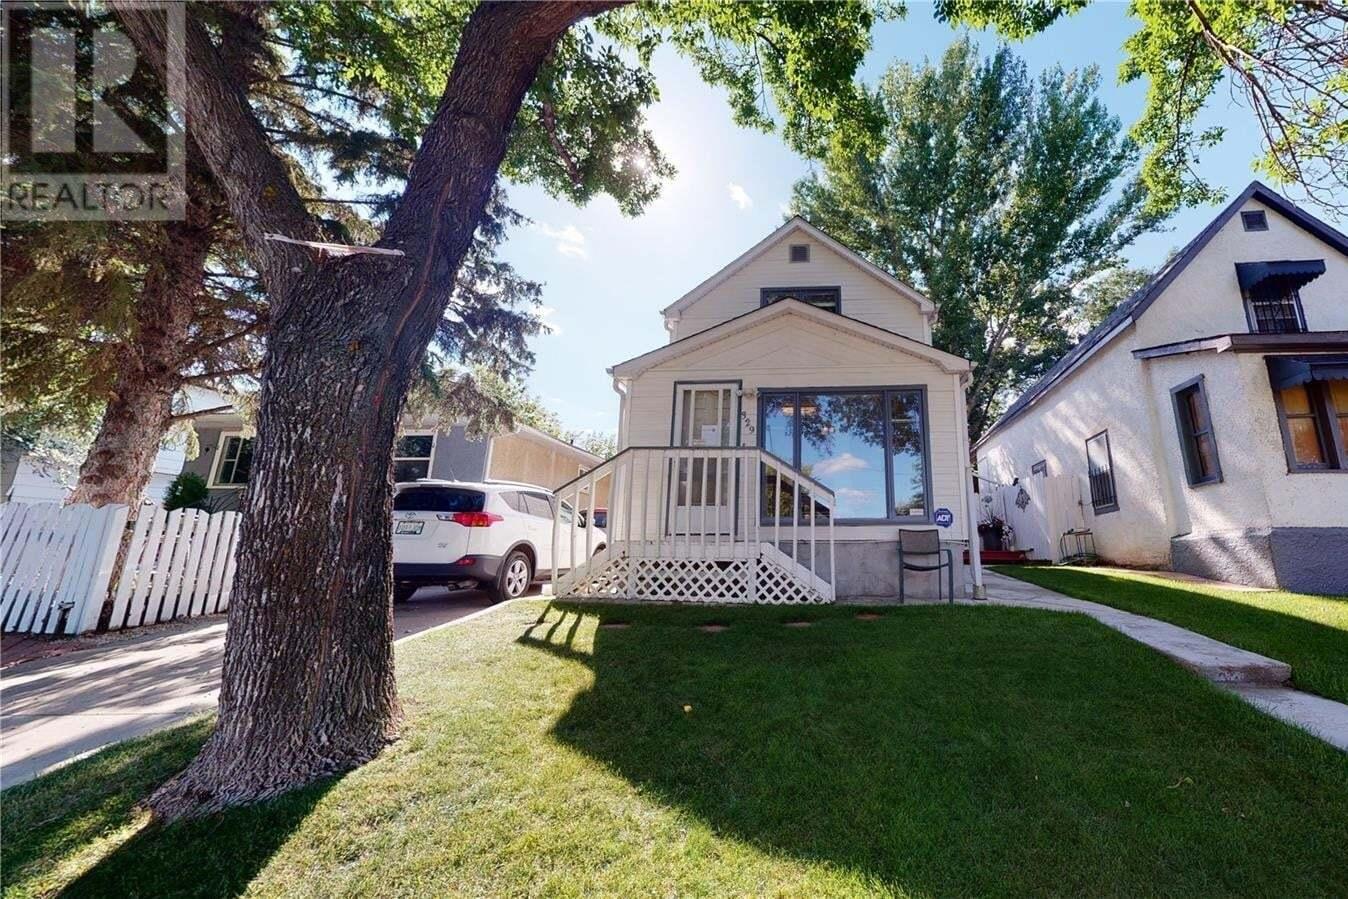 House for sale at 329 U Ave S Saskatoon Saskatchewan - MLS: SK827231